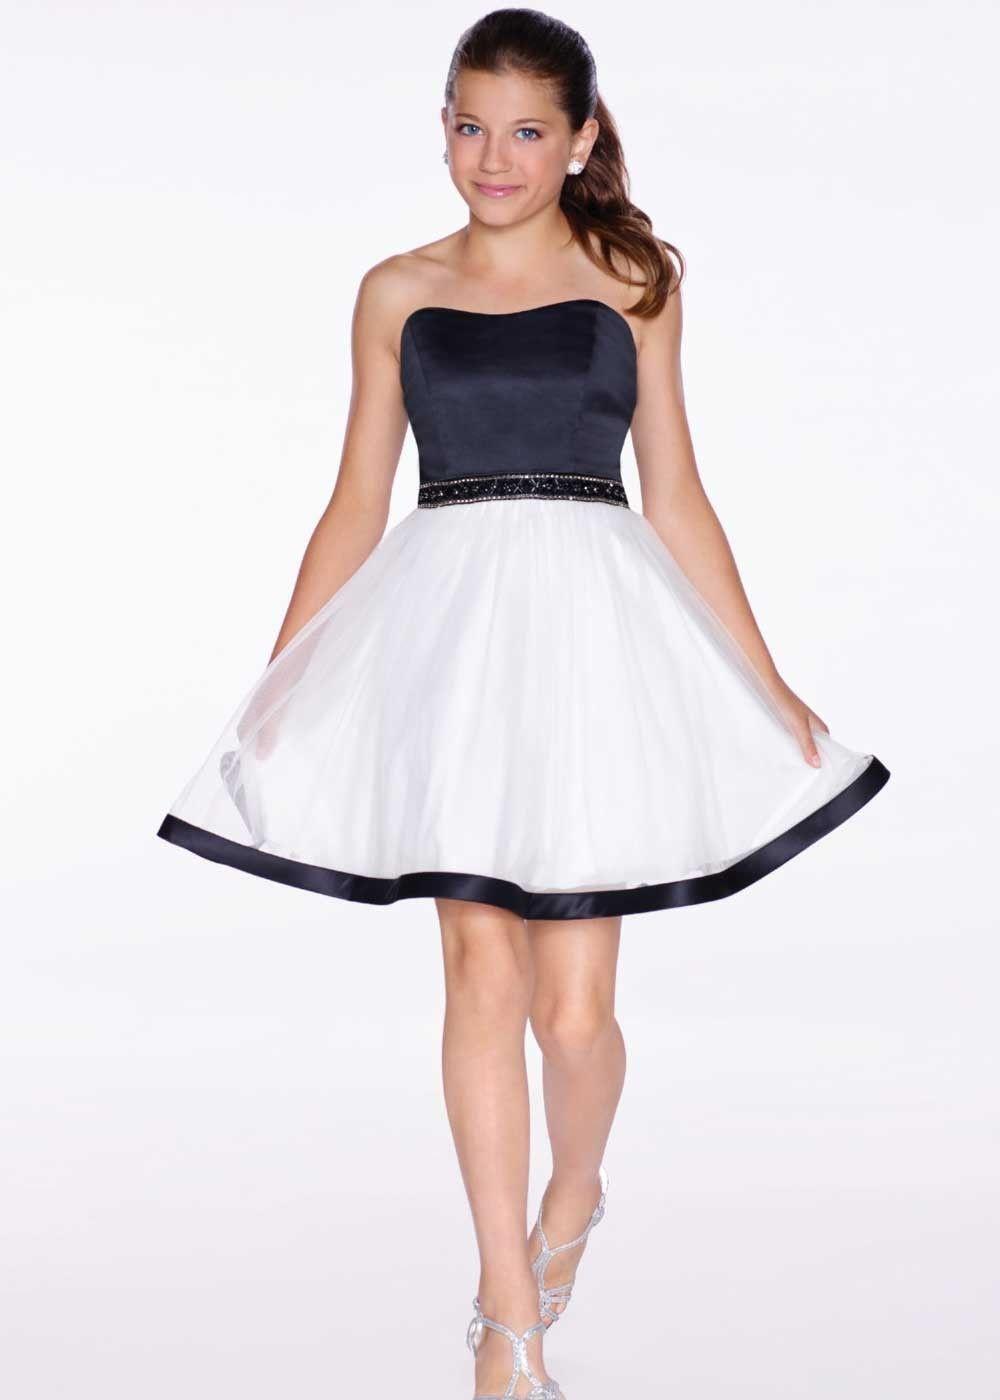 Lexie by Mon Cheri TW11664 Sleeveless Girls Party Dress | Ivory ...